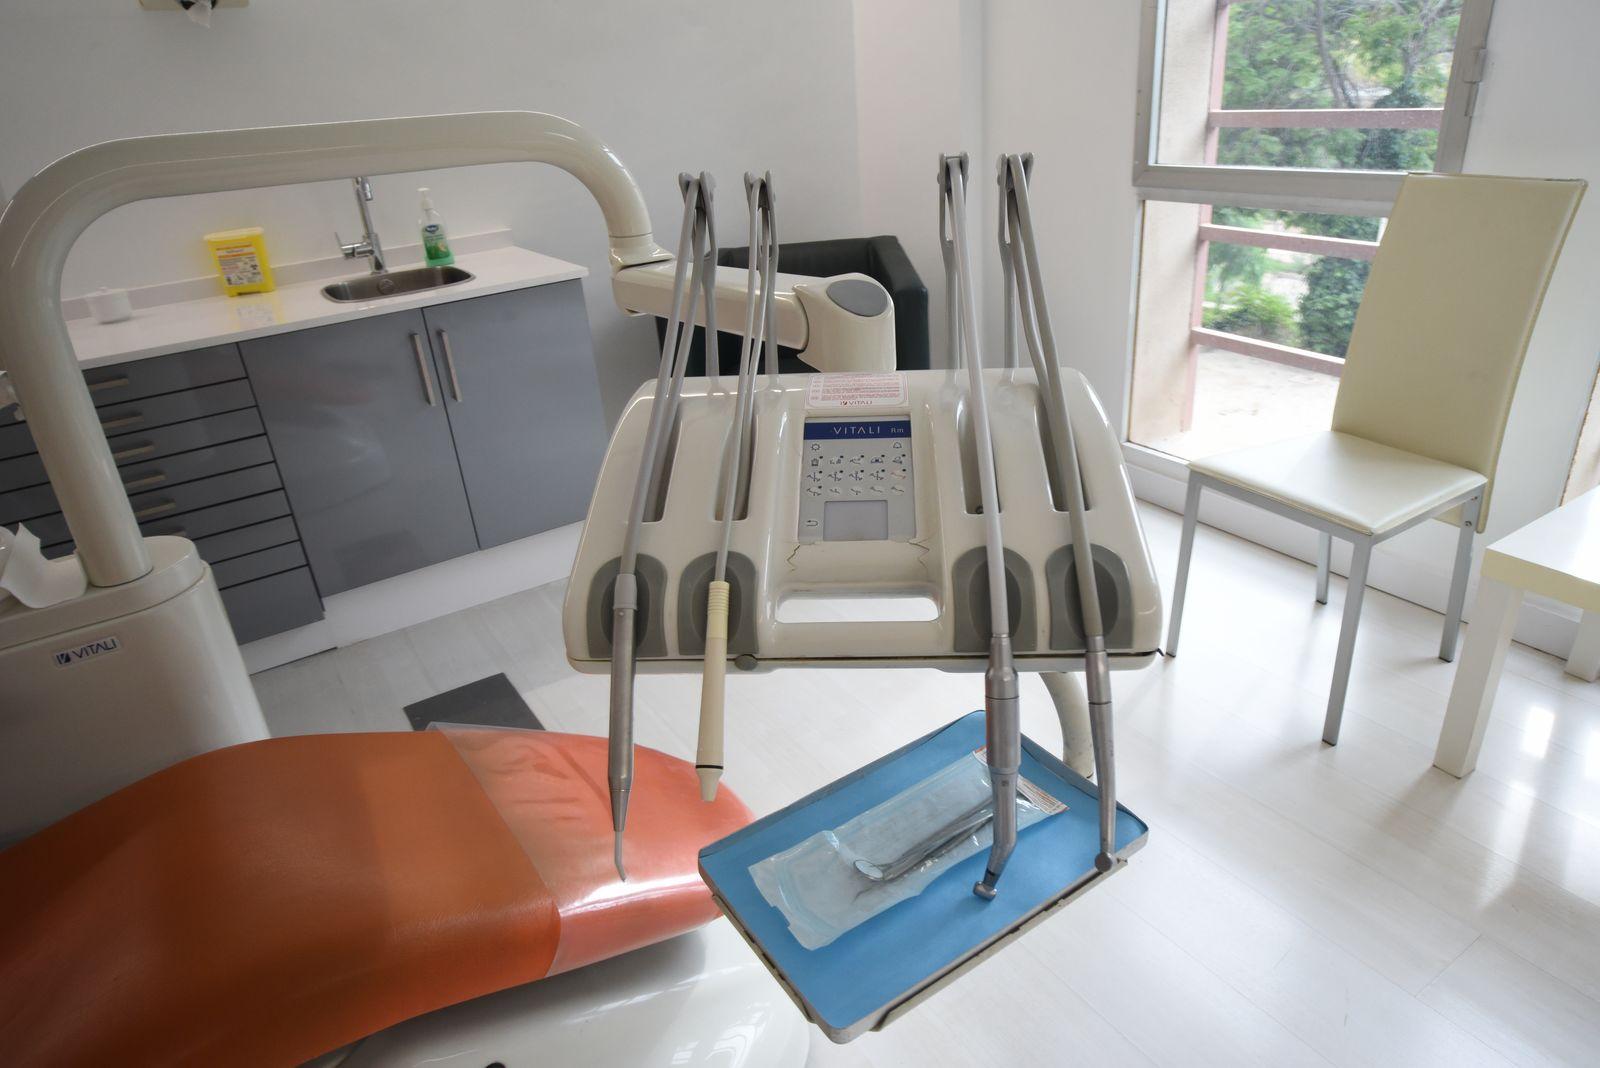 clinicas dentales en elche, clinica pons marfil, dentistas en elche, elche dentistas, dentistas elche